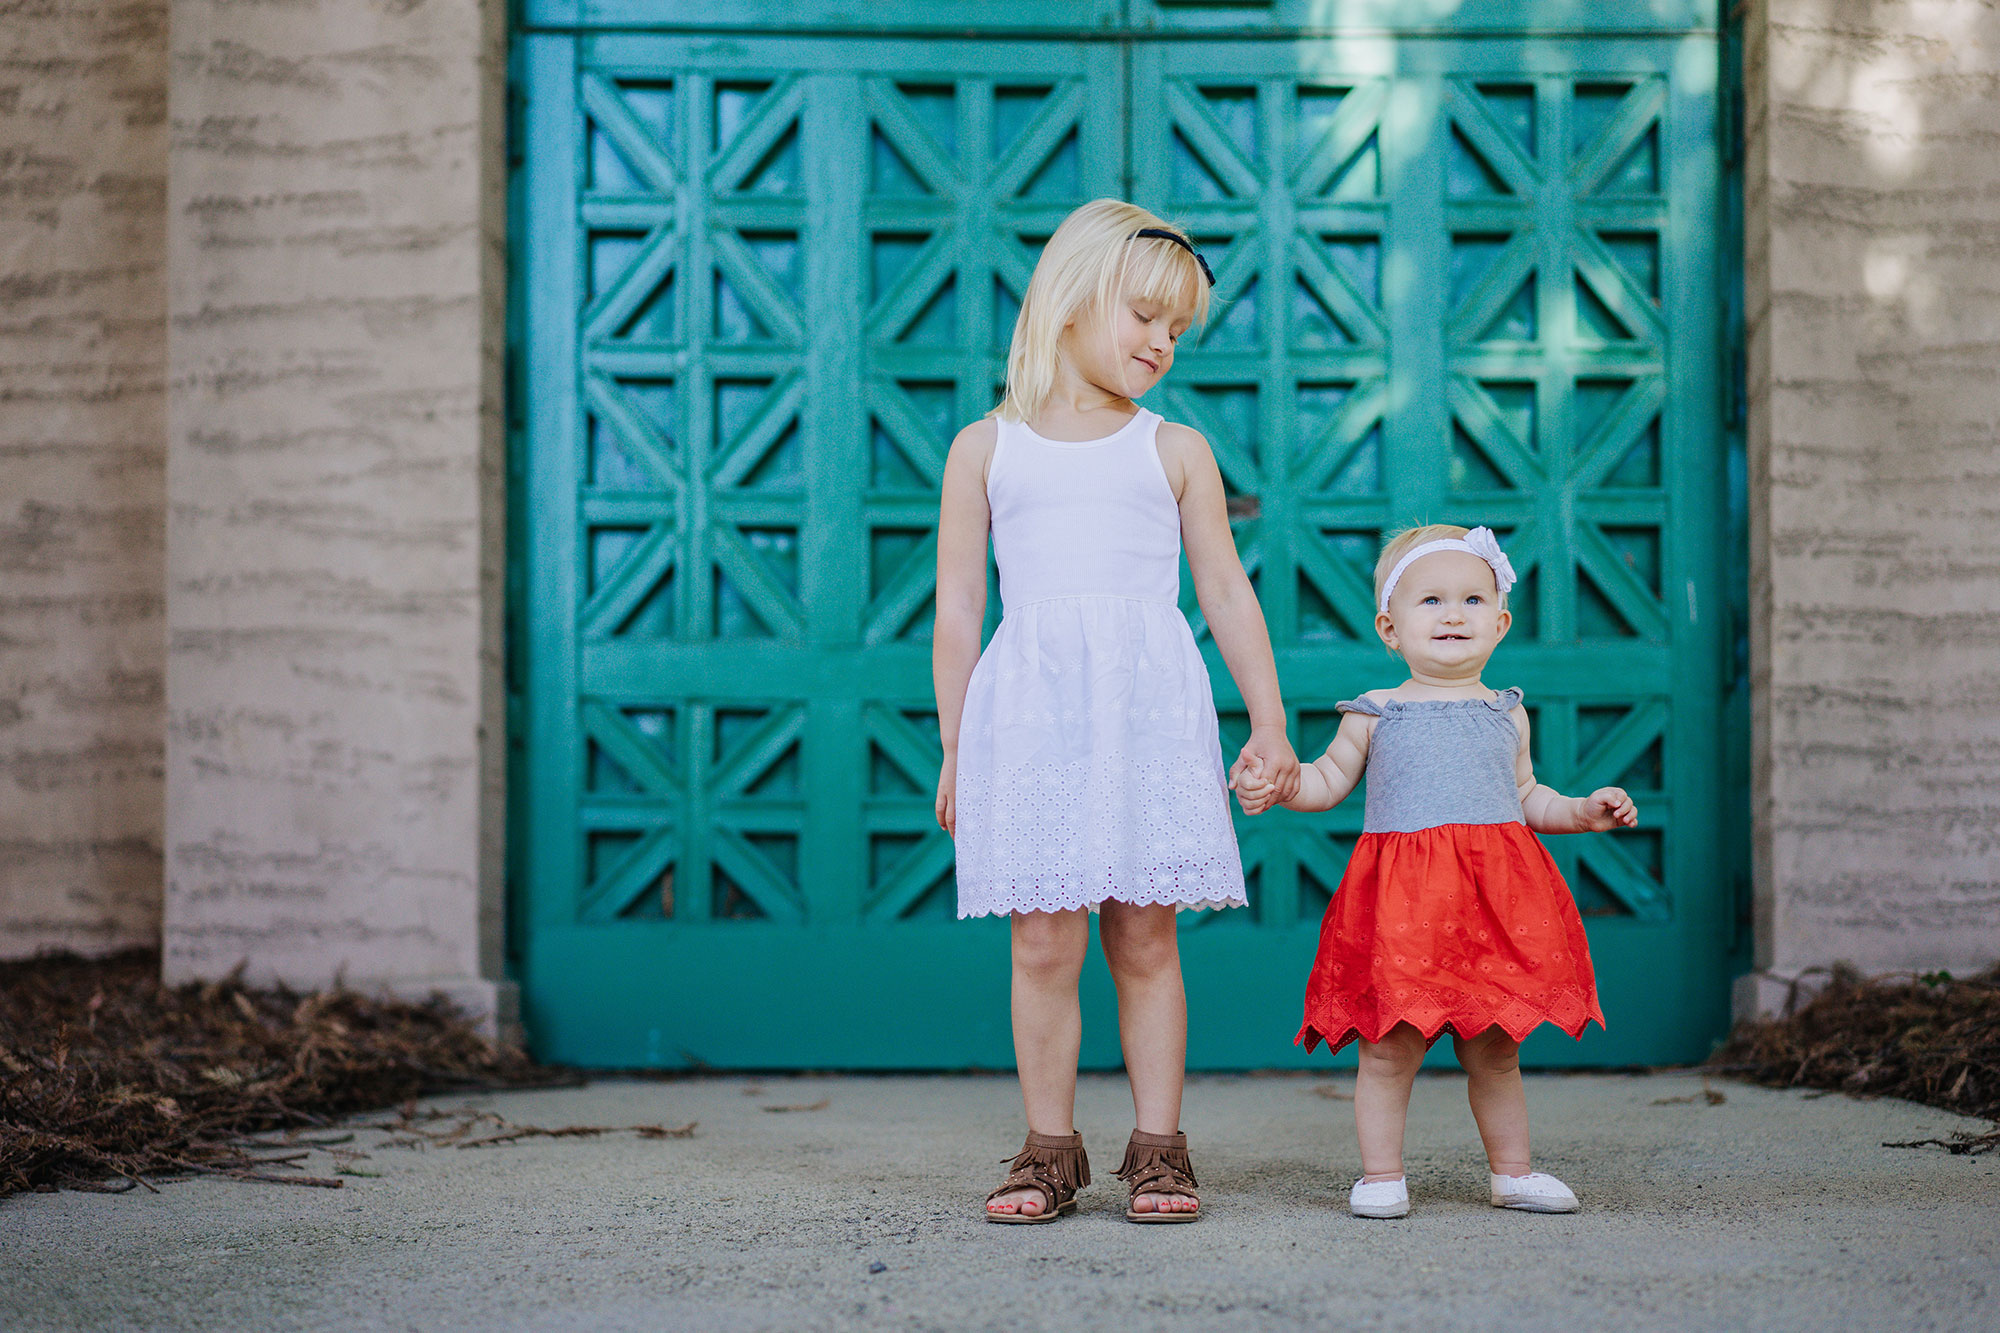 Happy birthday, Addison and Sienna!